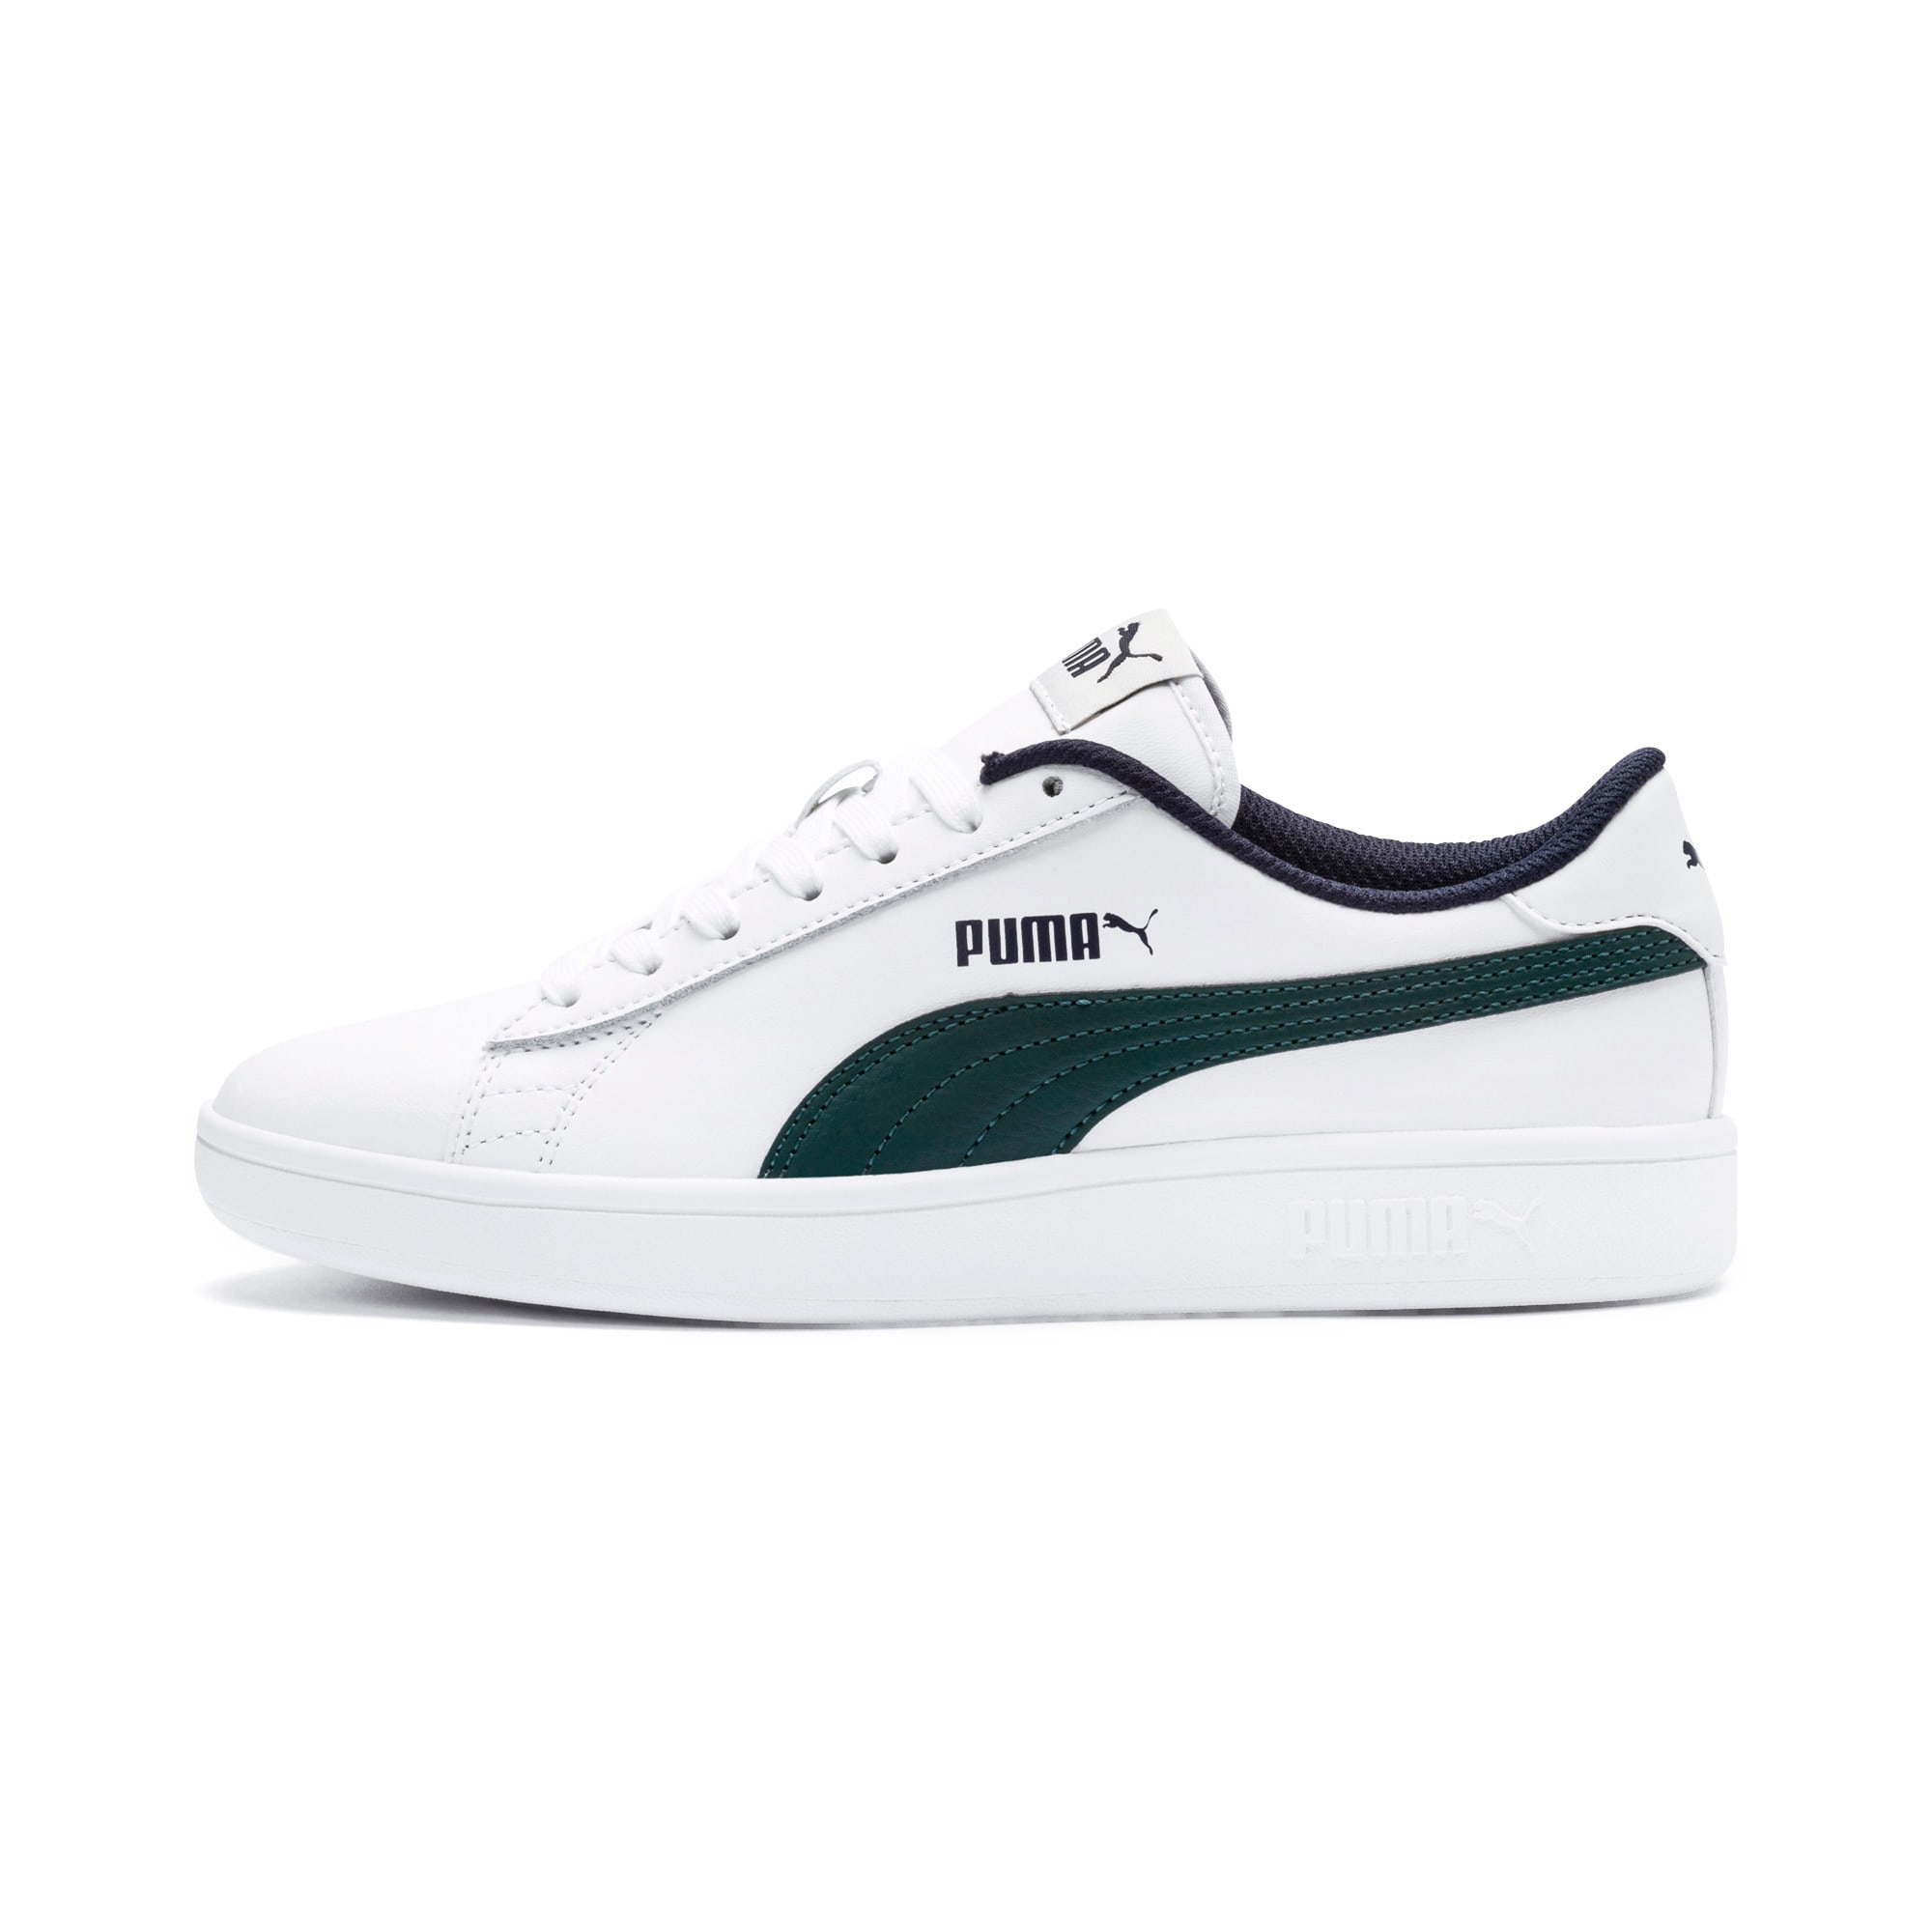 Thumbnail 1 of Smash v2 L sportschoenen voor kinderen, Puma White-Ponderosa Pine, medium